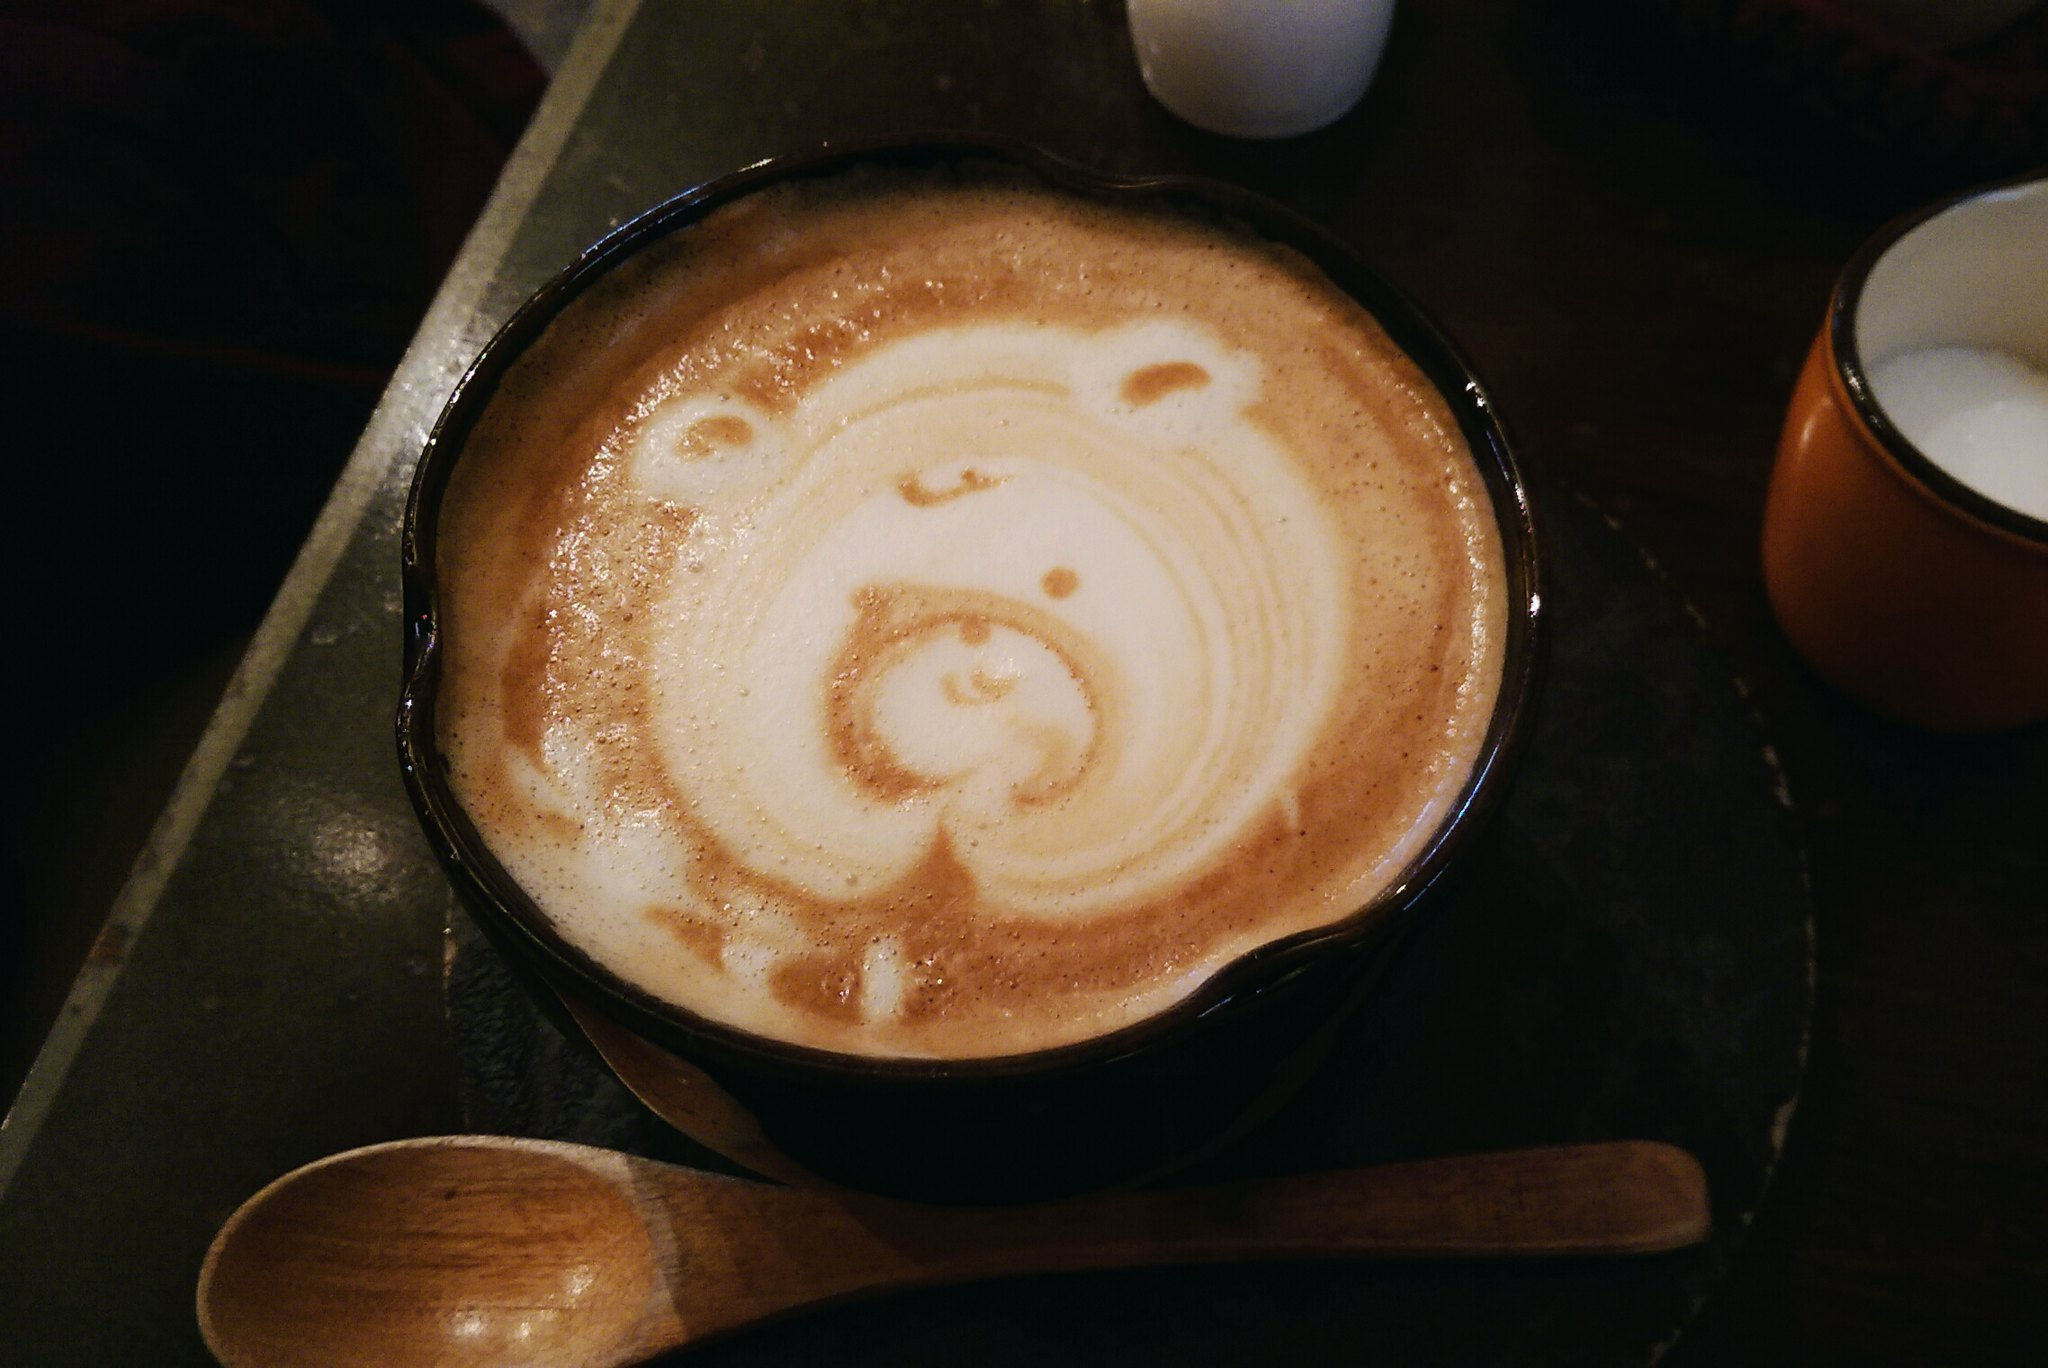 okinawa mother coffee